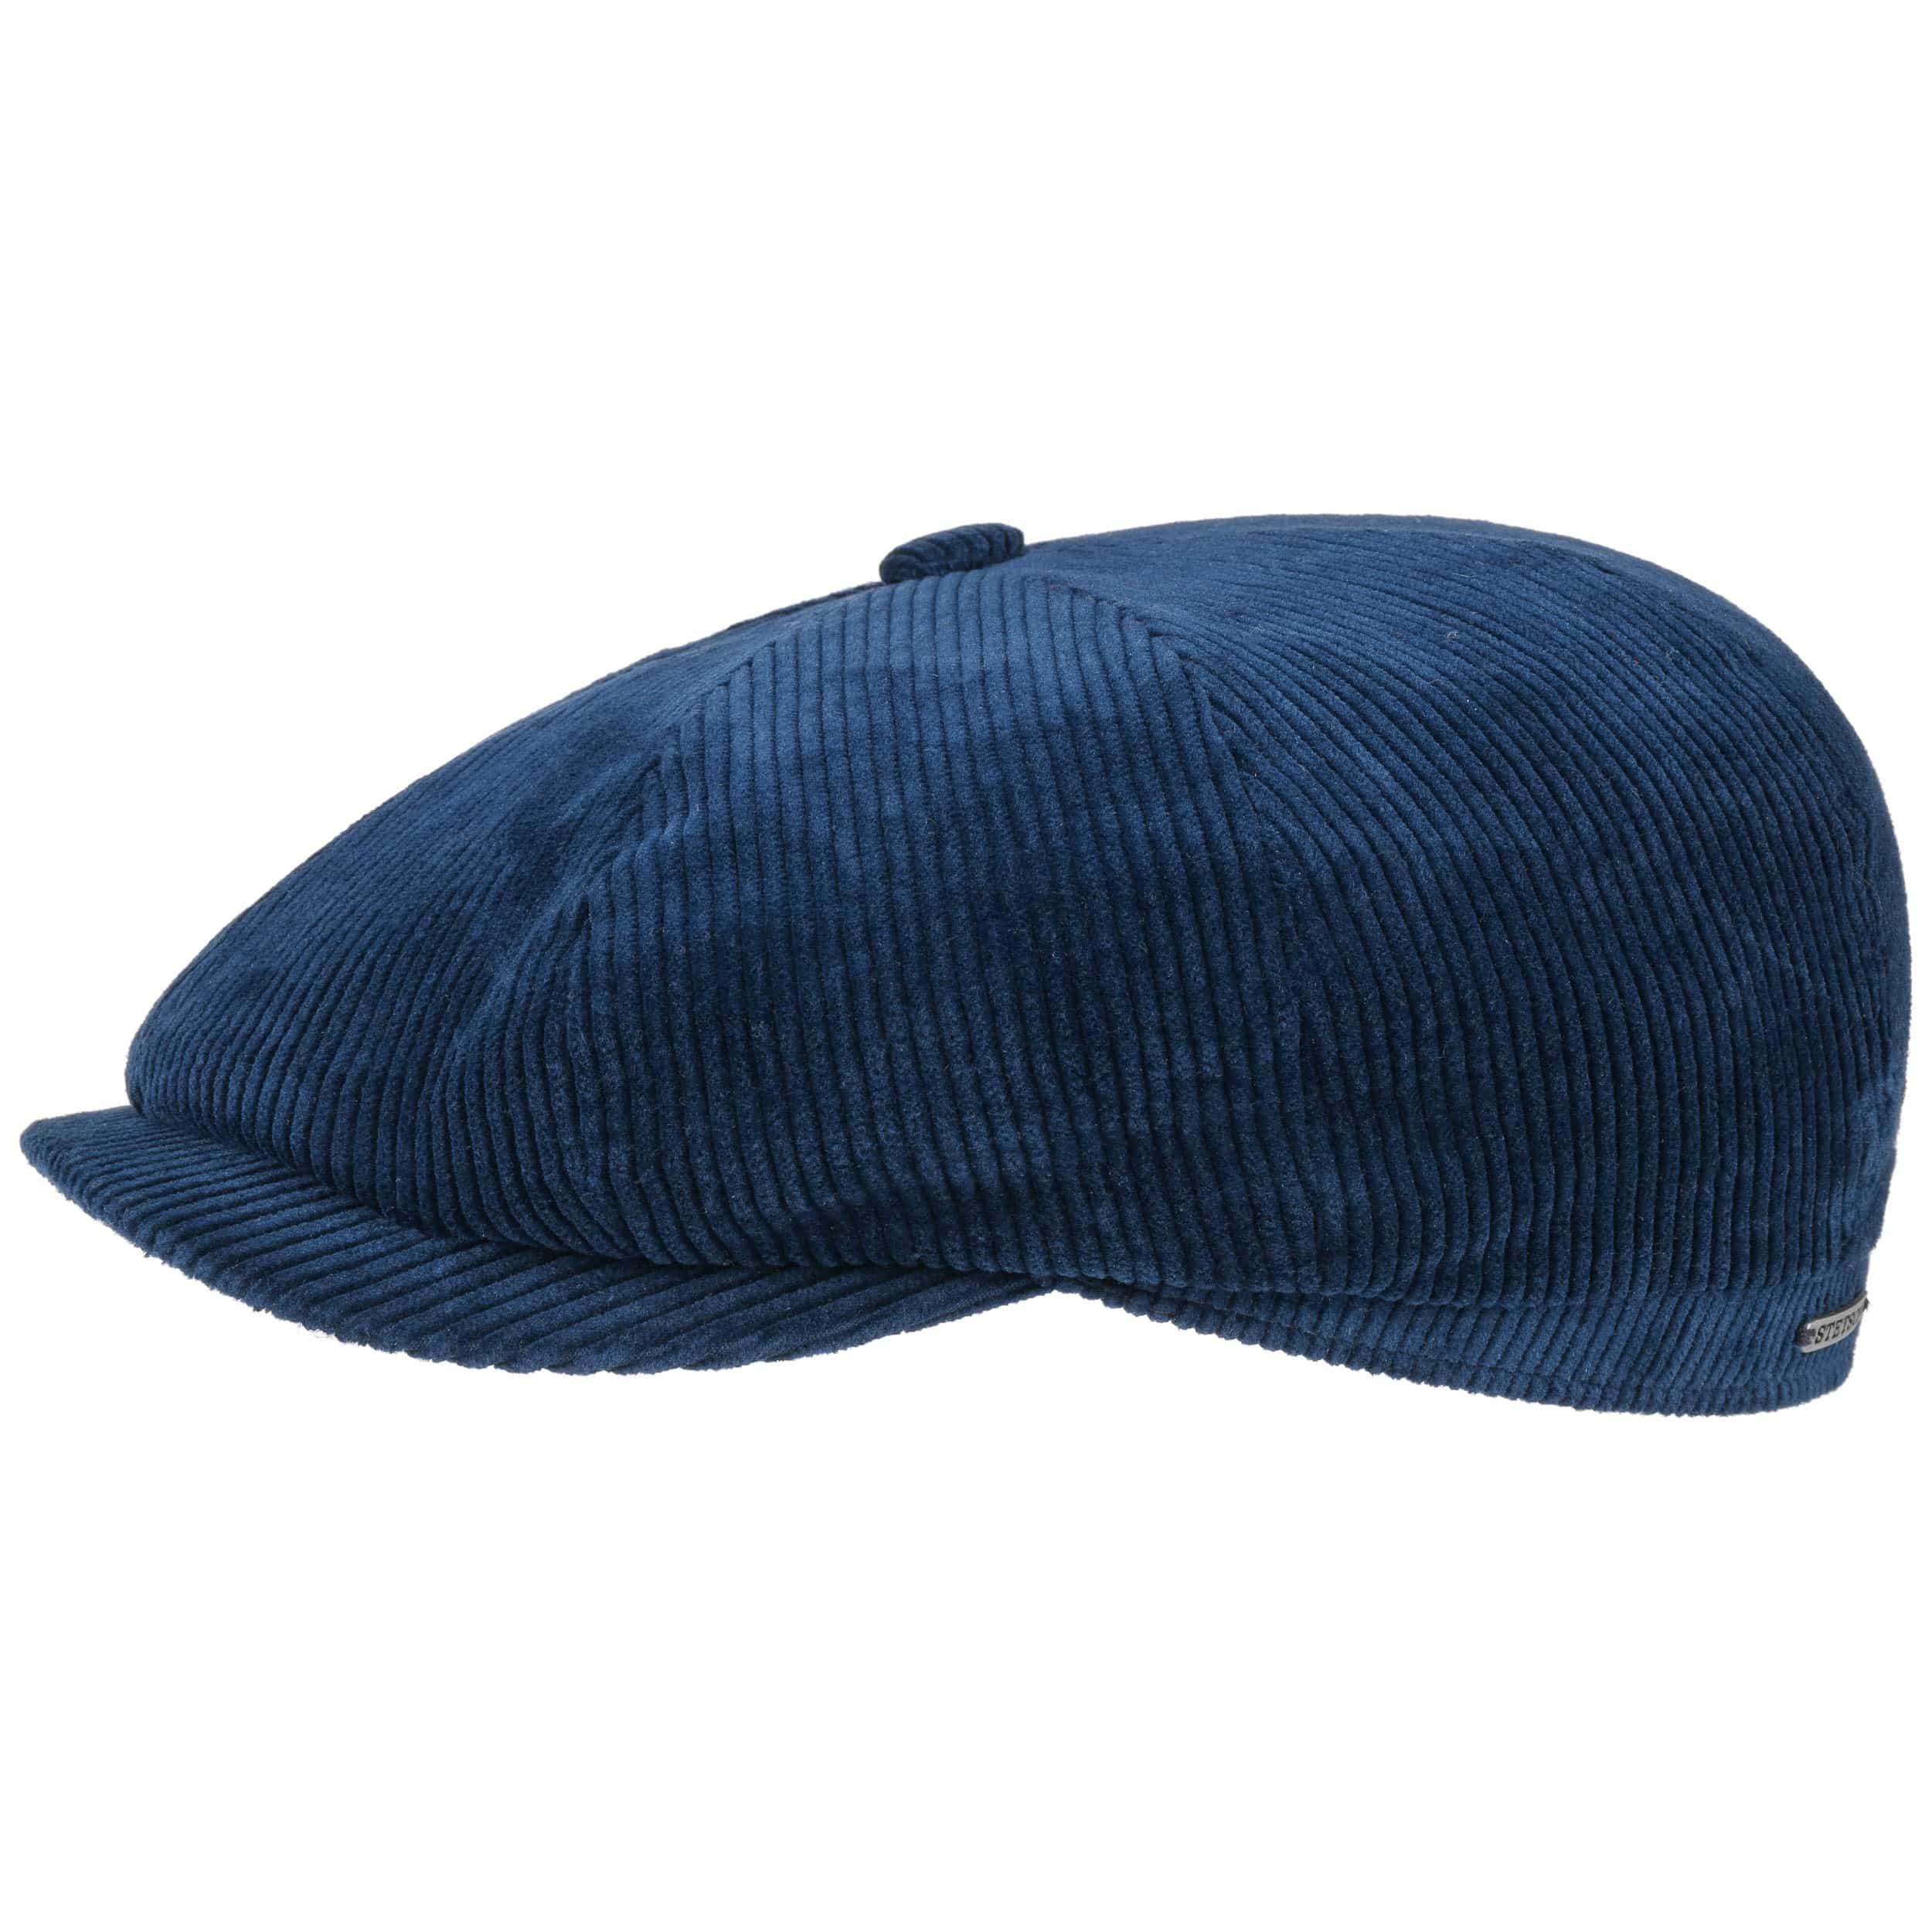 Gorra de Pana Hatteras Classic by Stetson - Gorras - sombreroshop.es 24cf5383df2